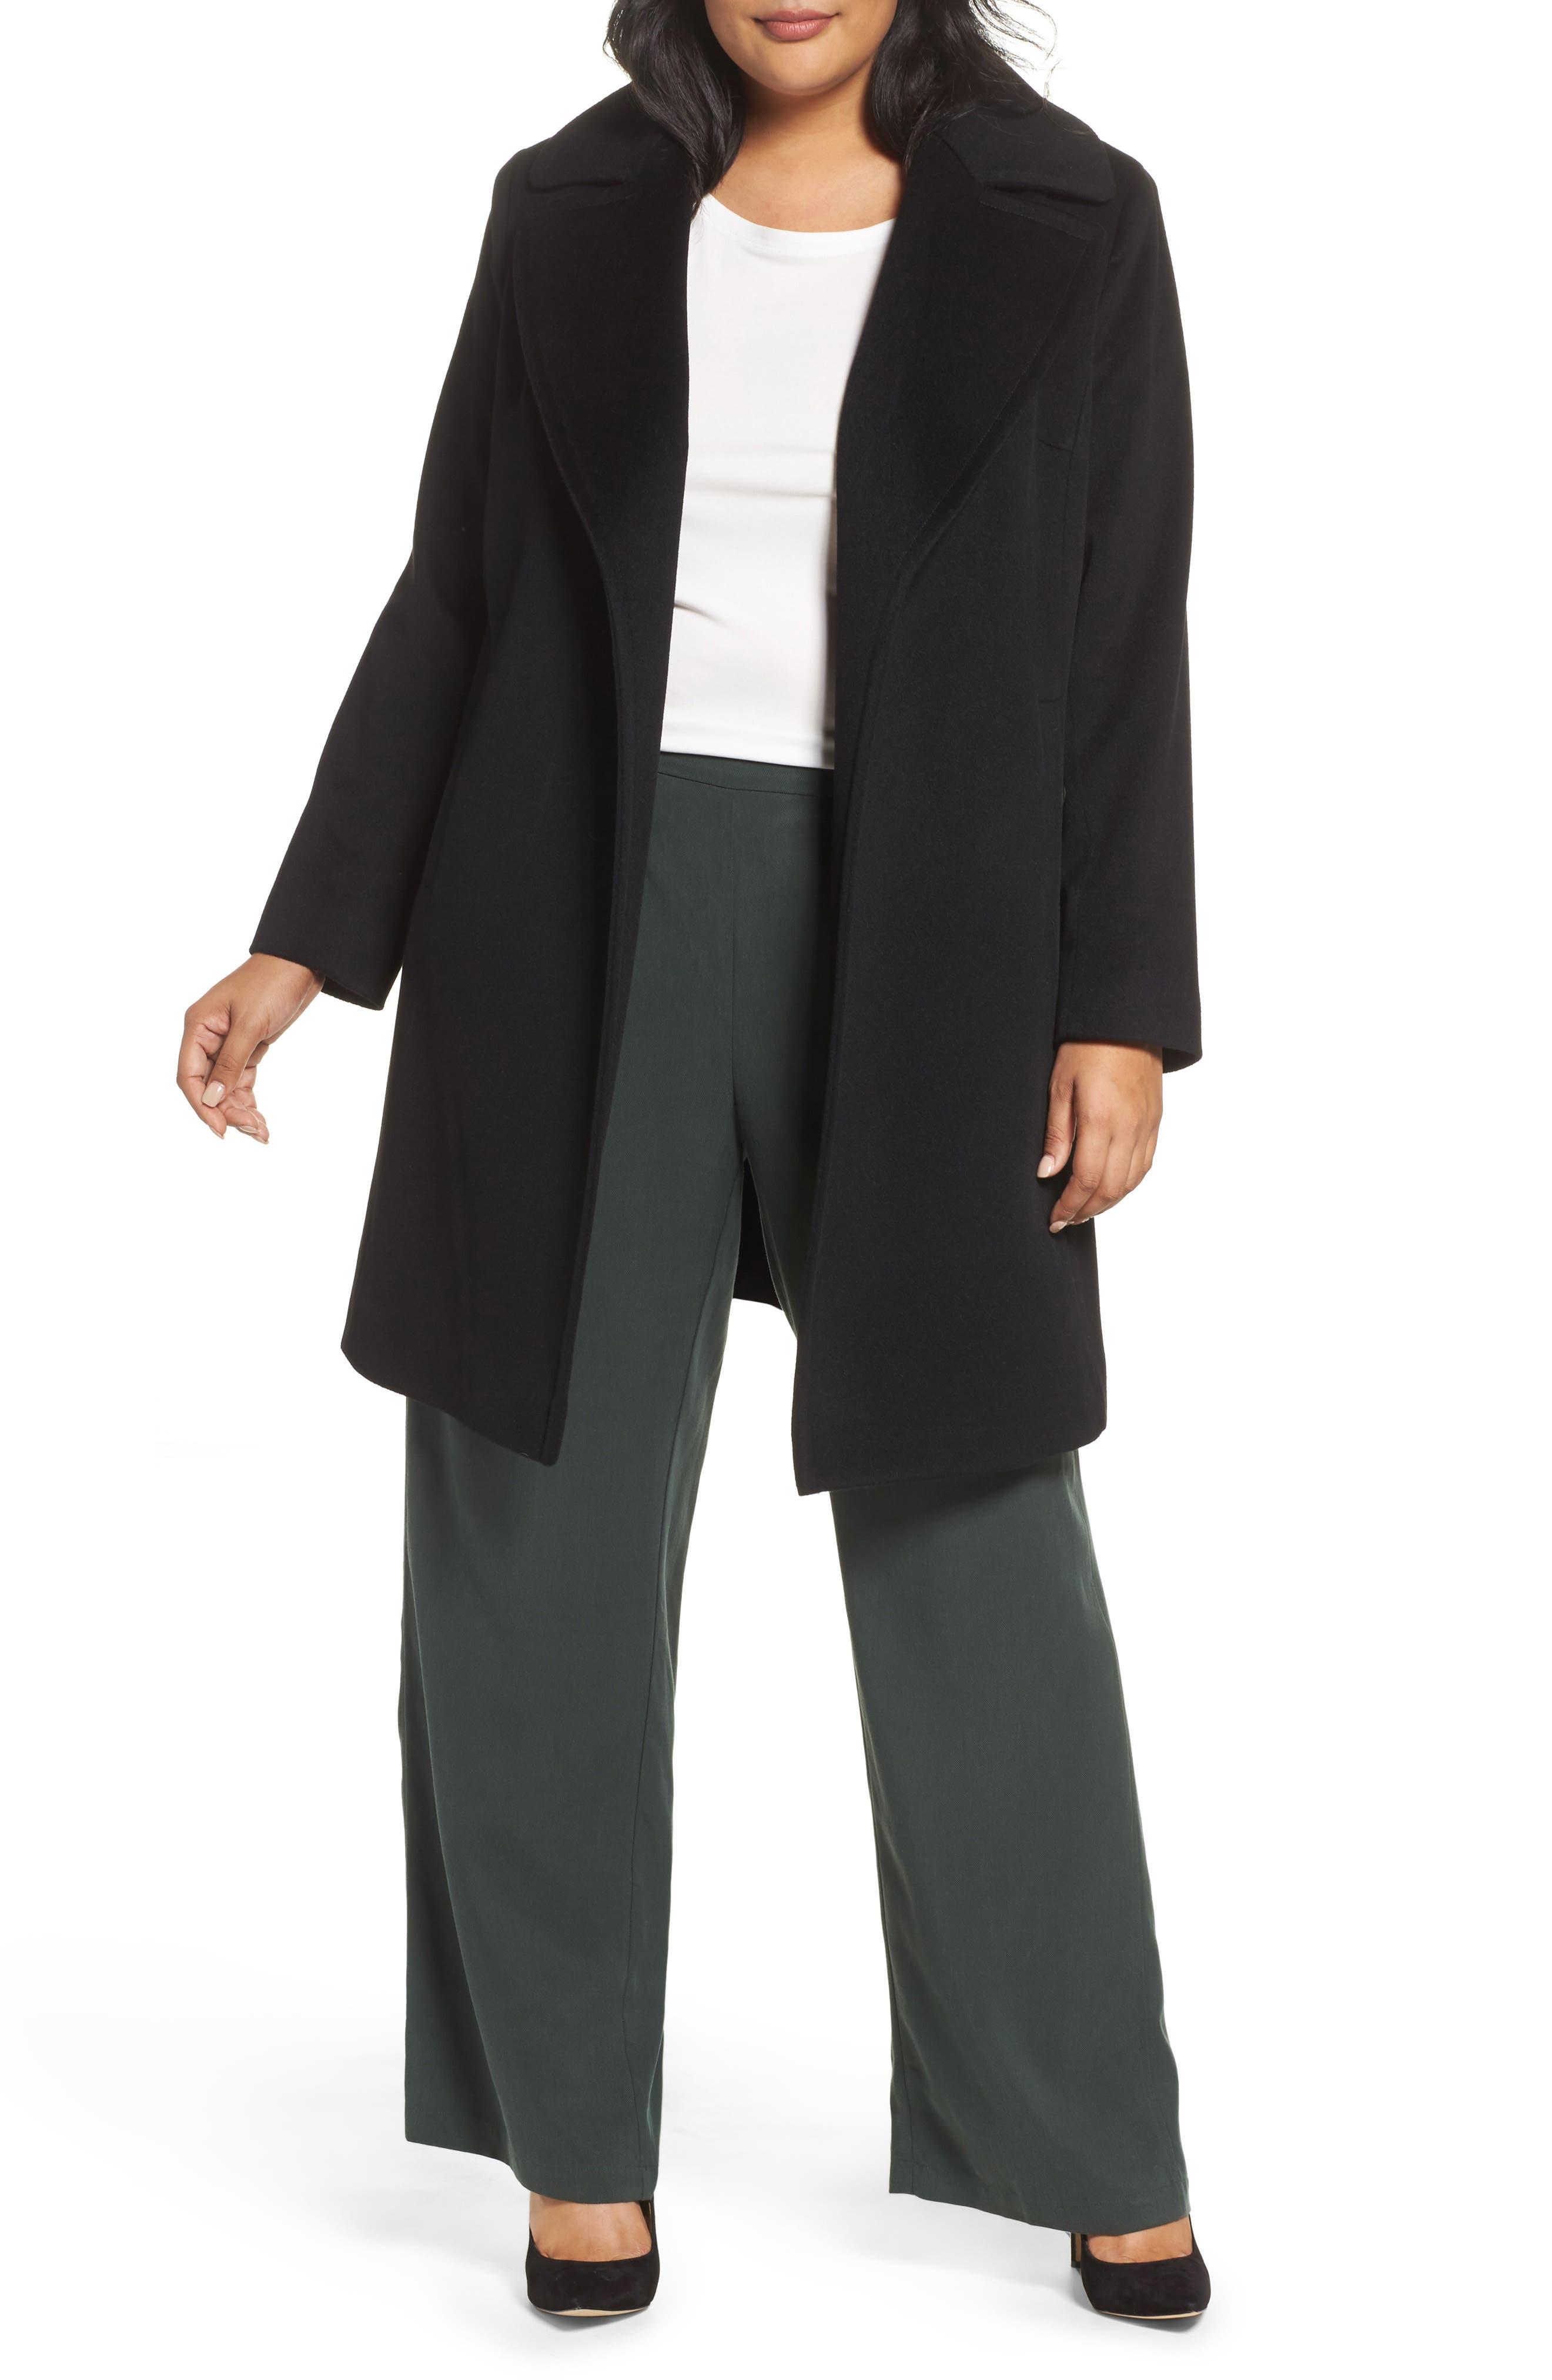 Alternate Image 1 Selected - Fleurette Wool Wrap Coat (Plus Size)